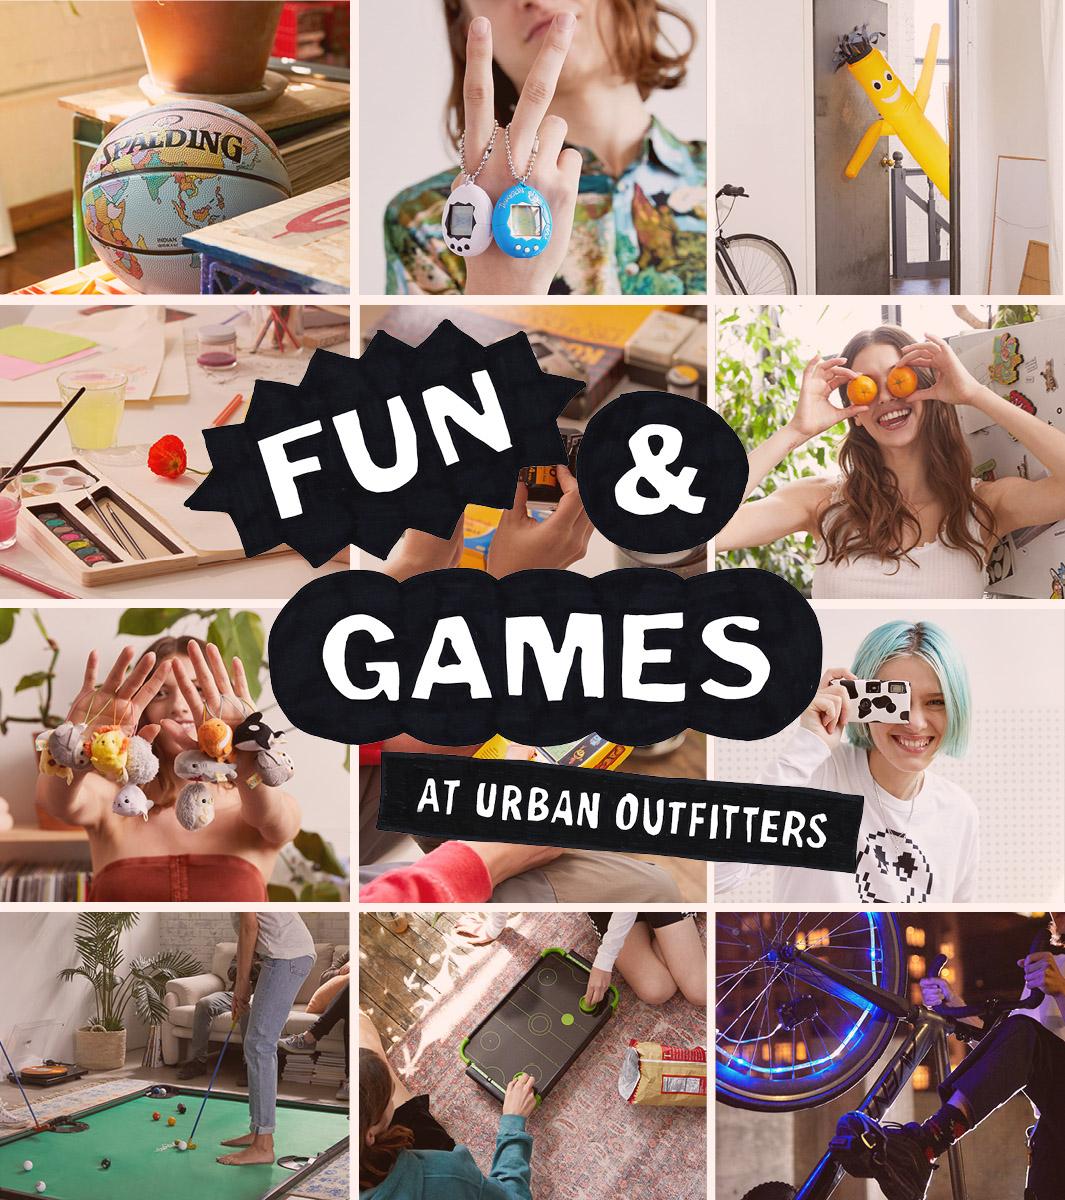 Shop fun games